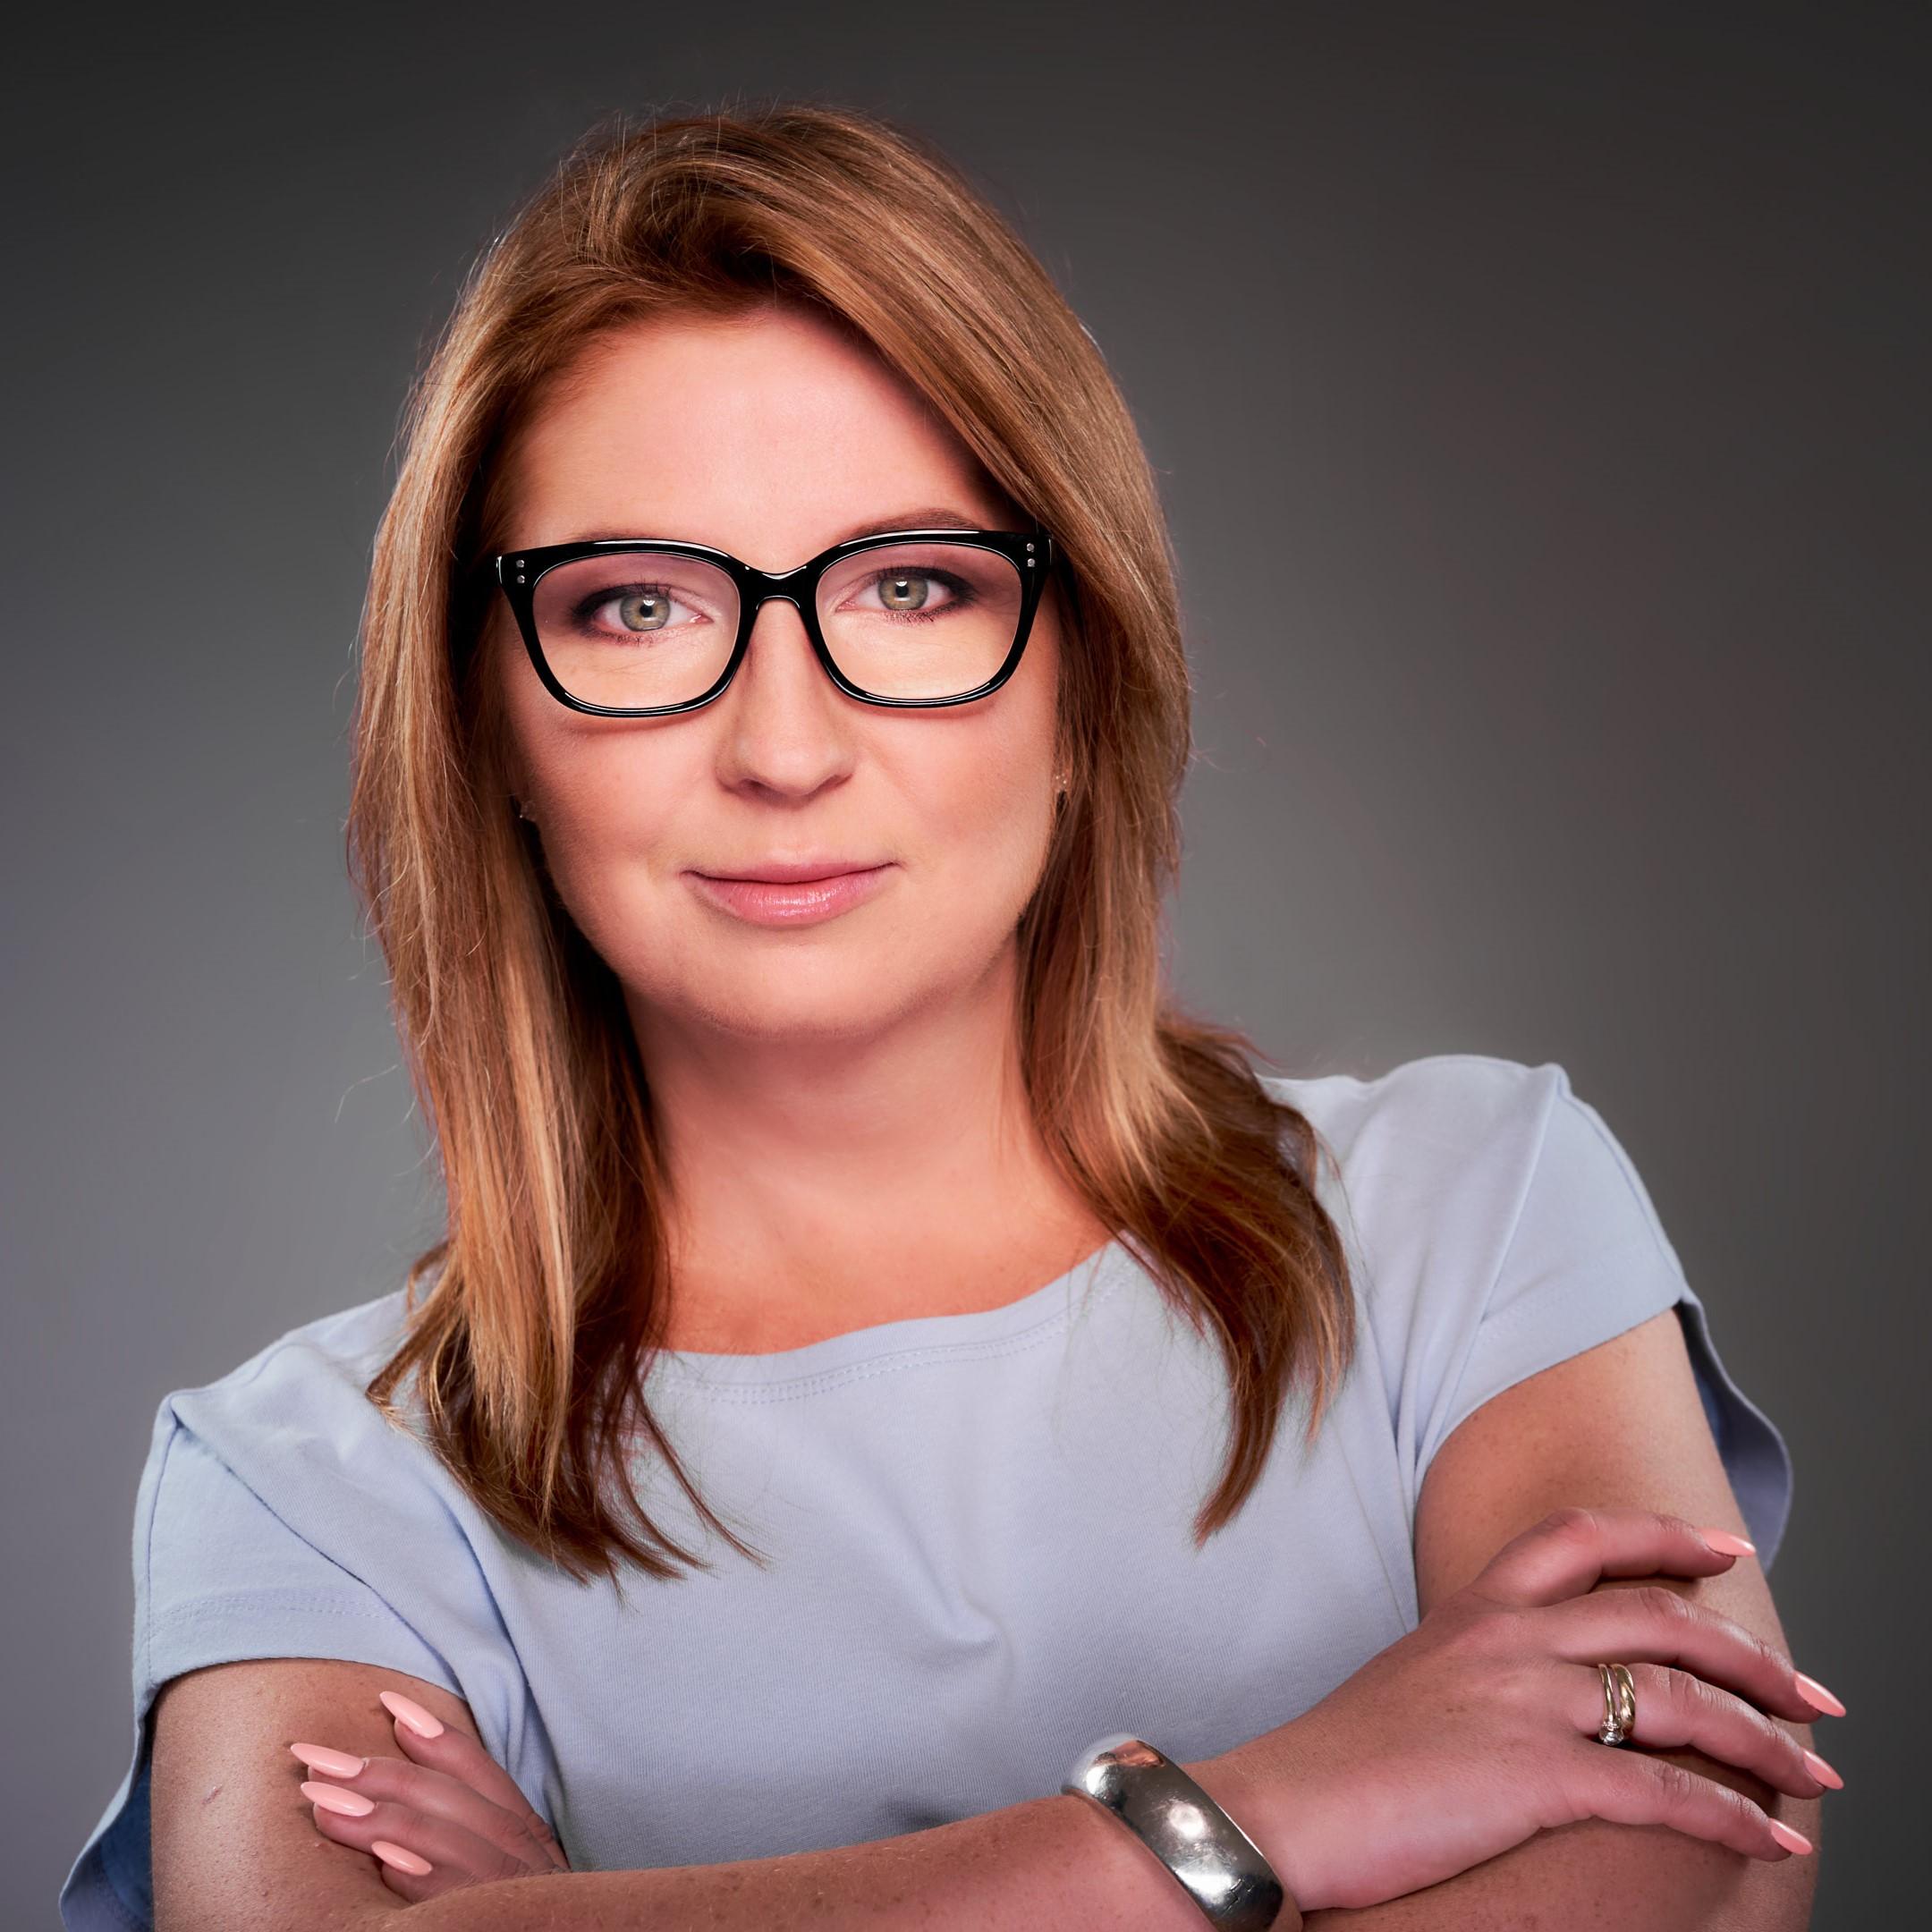 Elżbieta Obrębowska